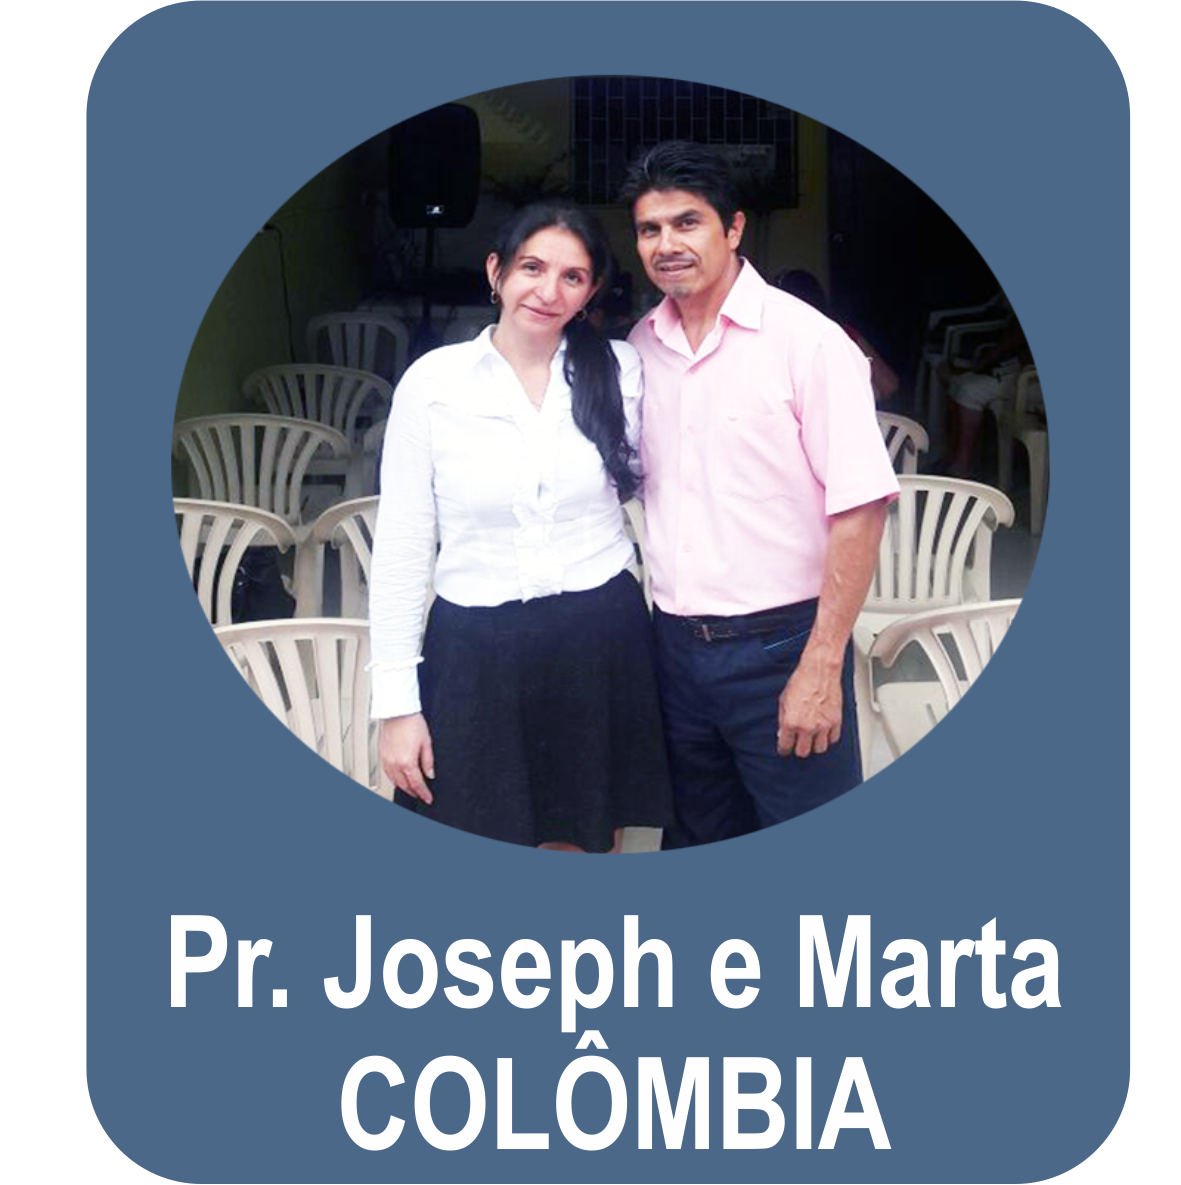 Missº. Joseph Heridia e Miss. Marta Yanet Saravia - COLÔMBIA - Ibaqué